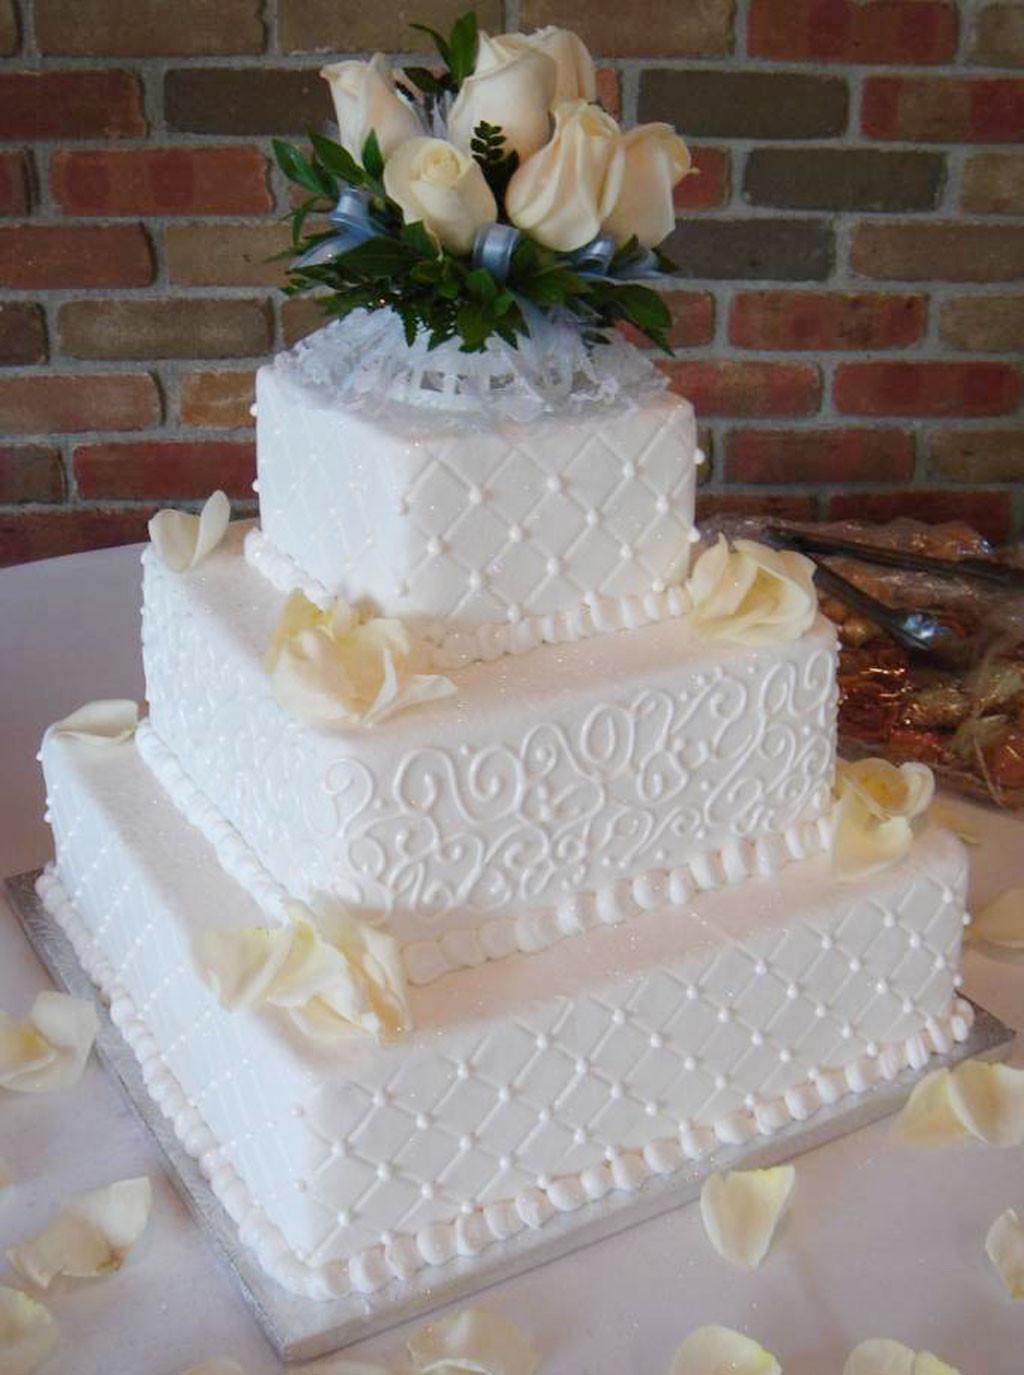 Wedding Cake Cupcakes With Buttercream Frosting  Wedding Cupcake Buttercream Recipe — Dishmaps